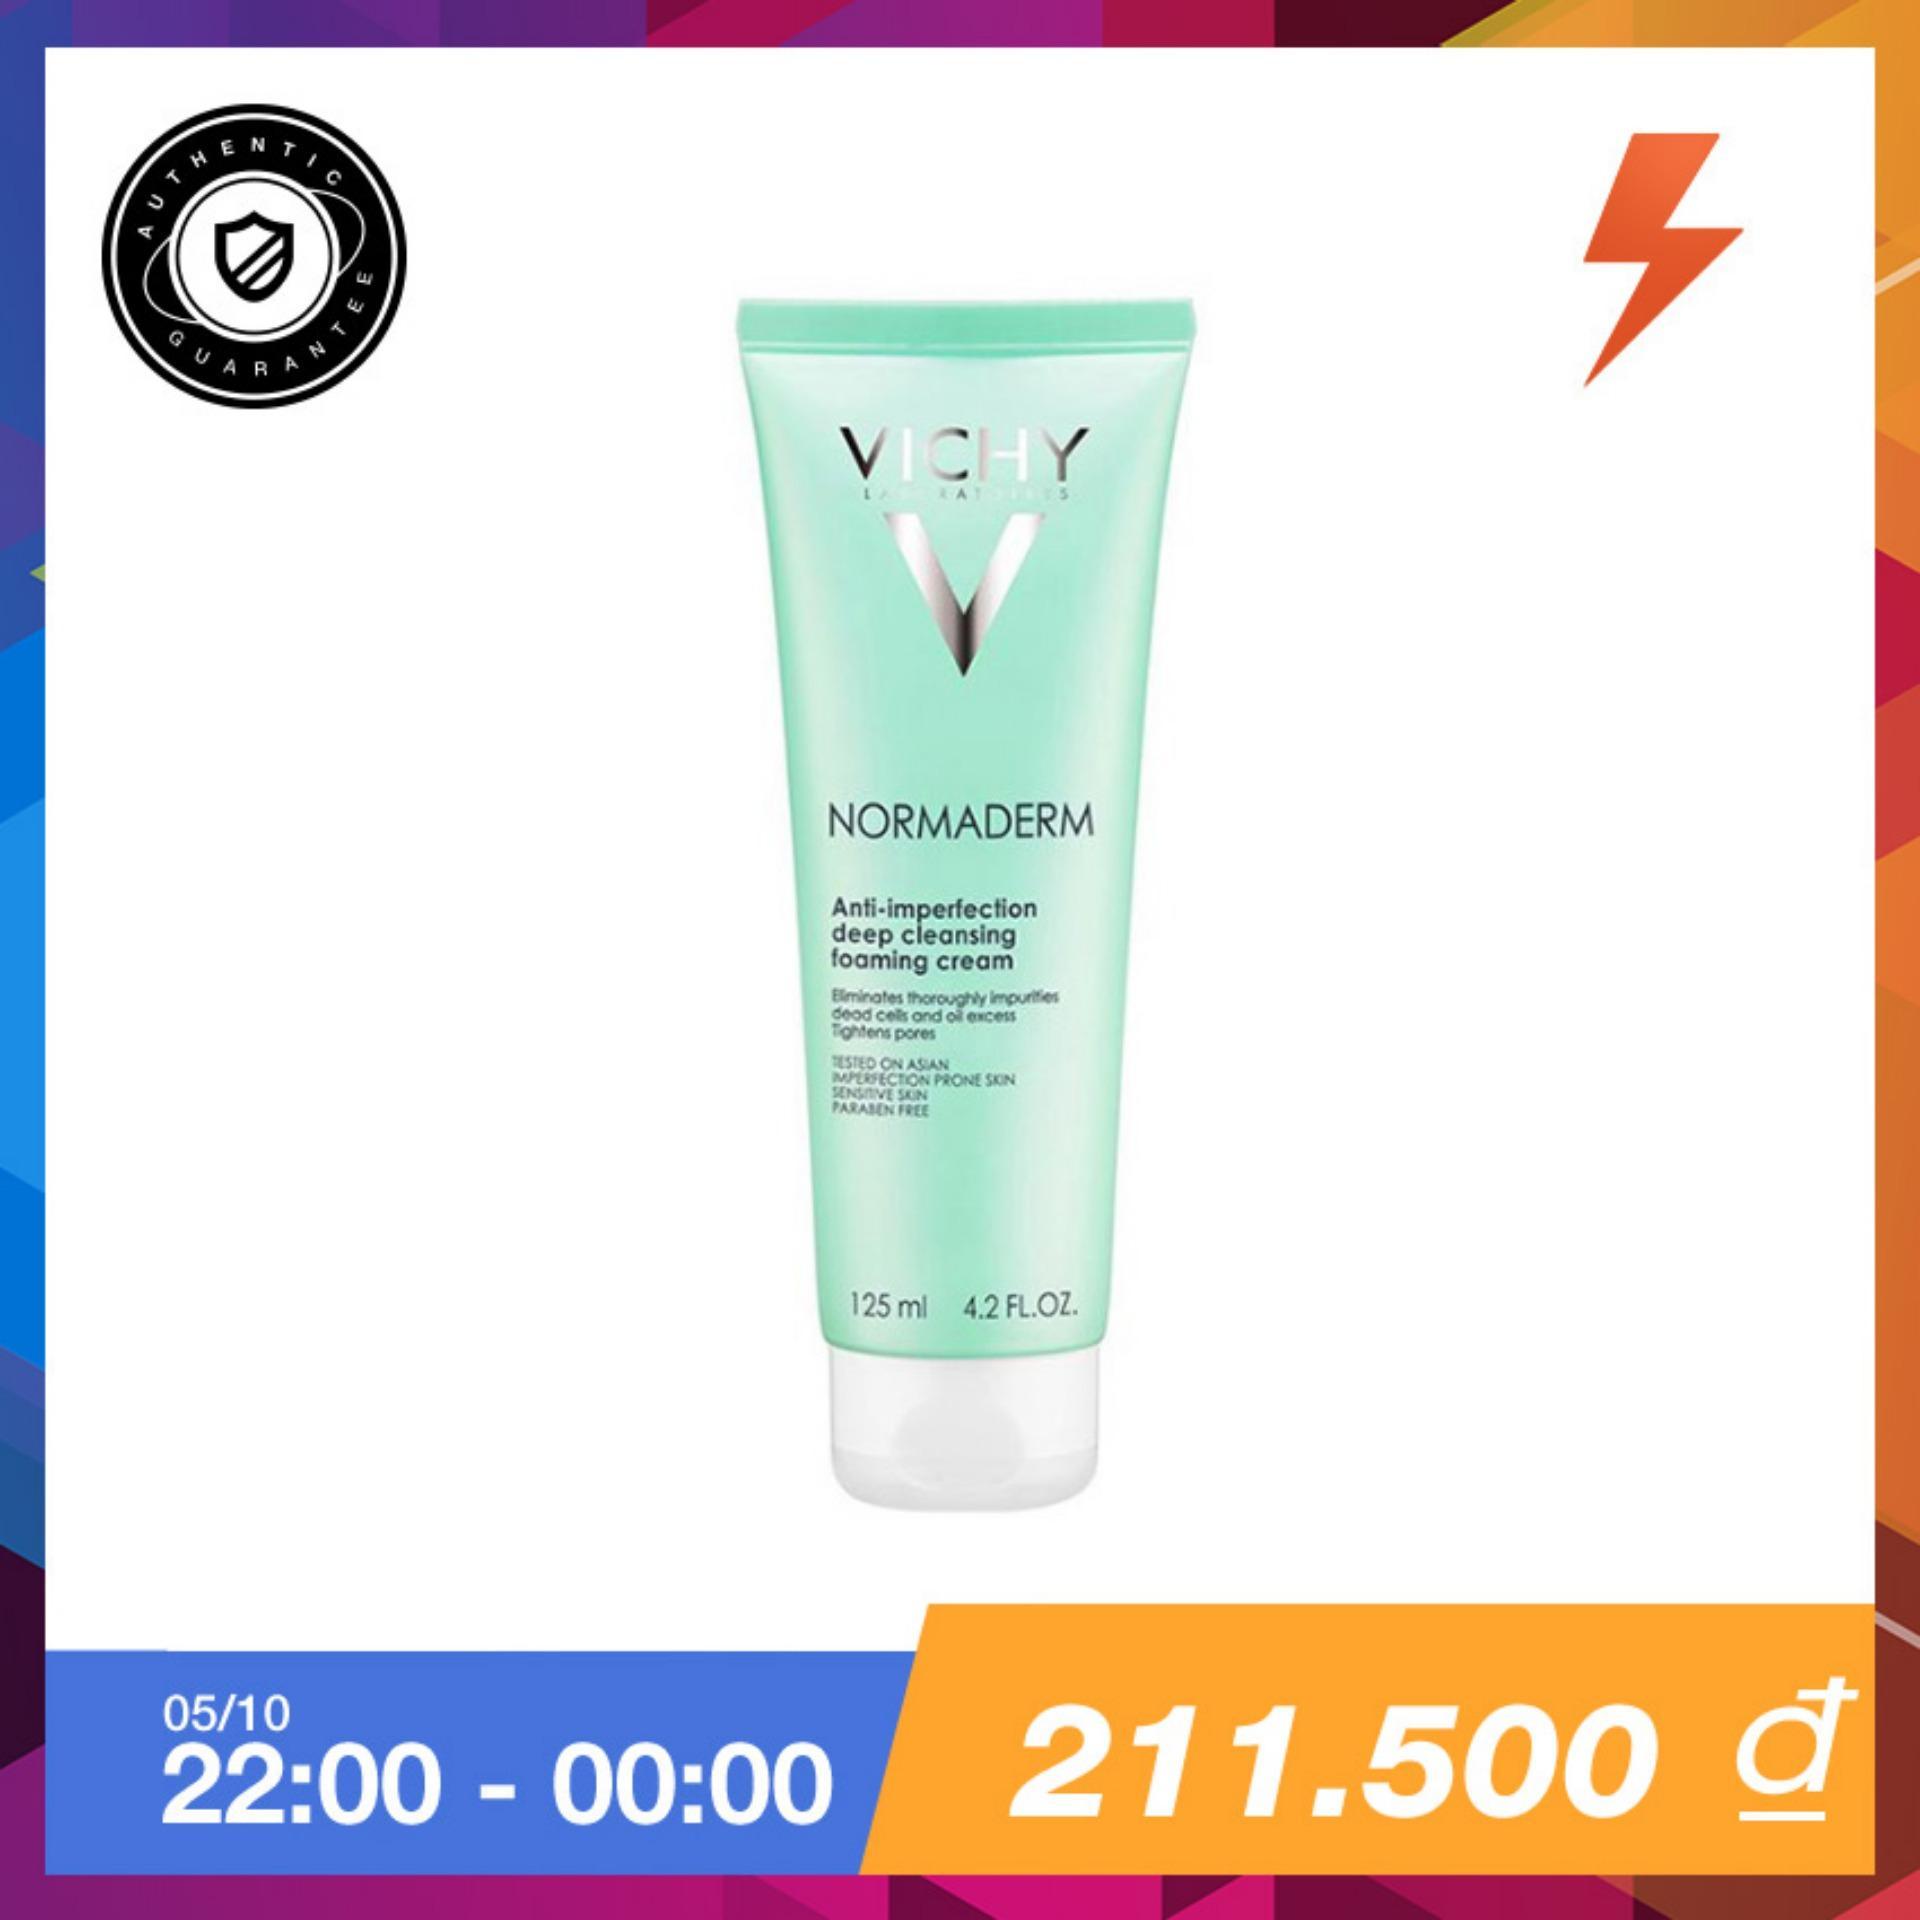 Chiết Khấu Sữa Rửa Mặt Ngăn Ngừa Mụn Vichy Normaderm Anti Imperfection Deep Cleansing Foaming Cream 125Ml